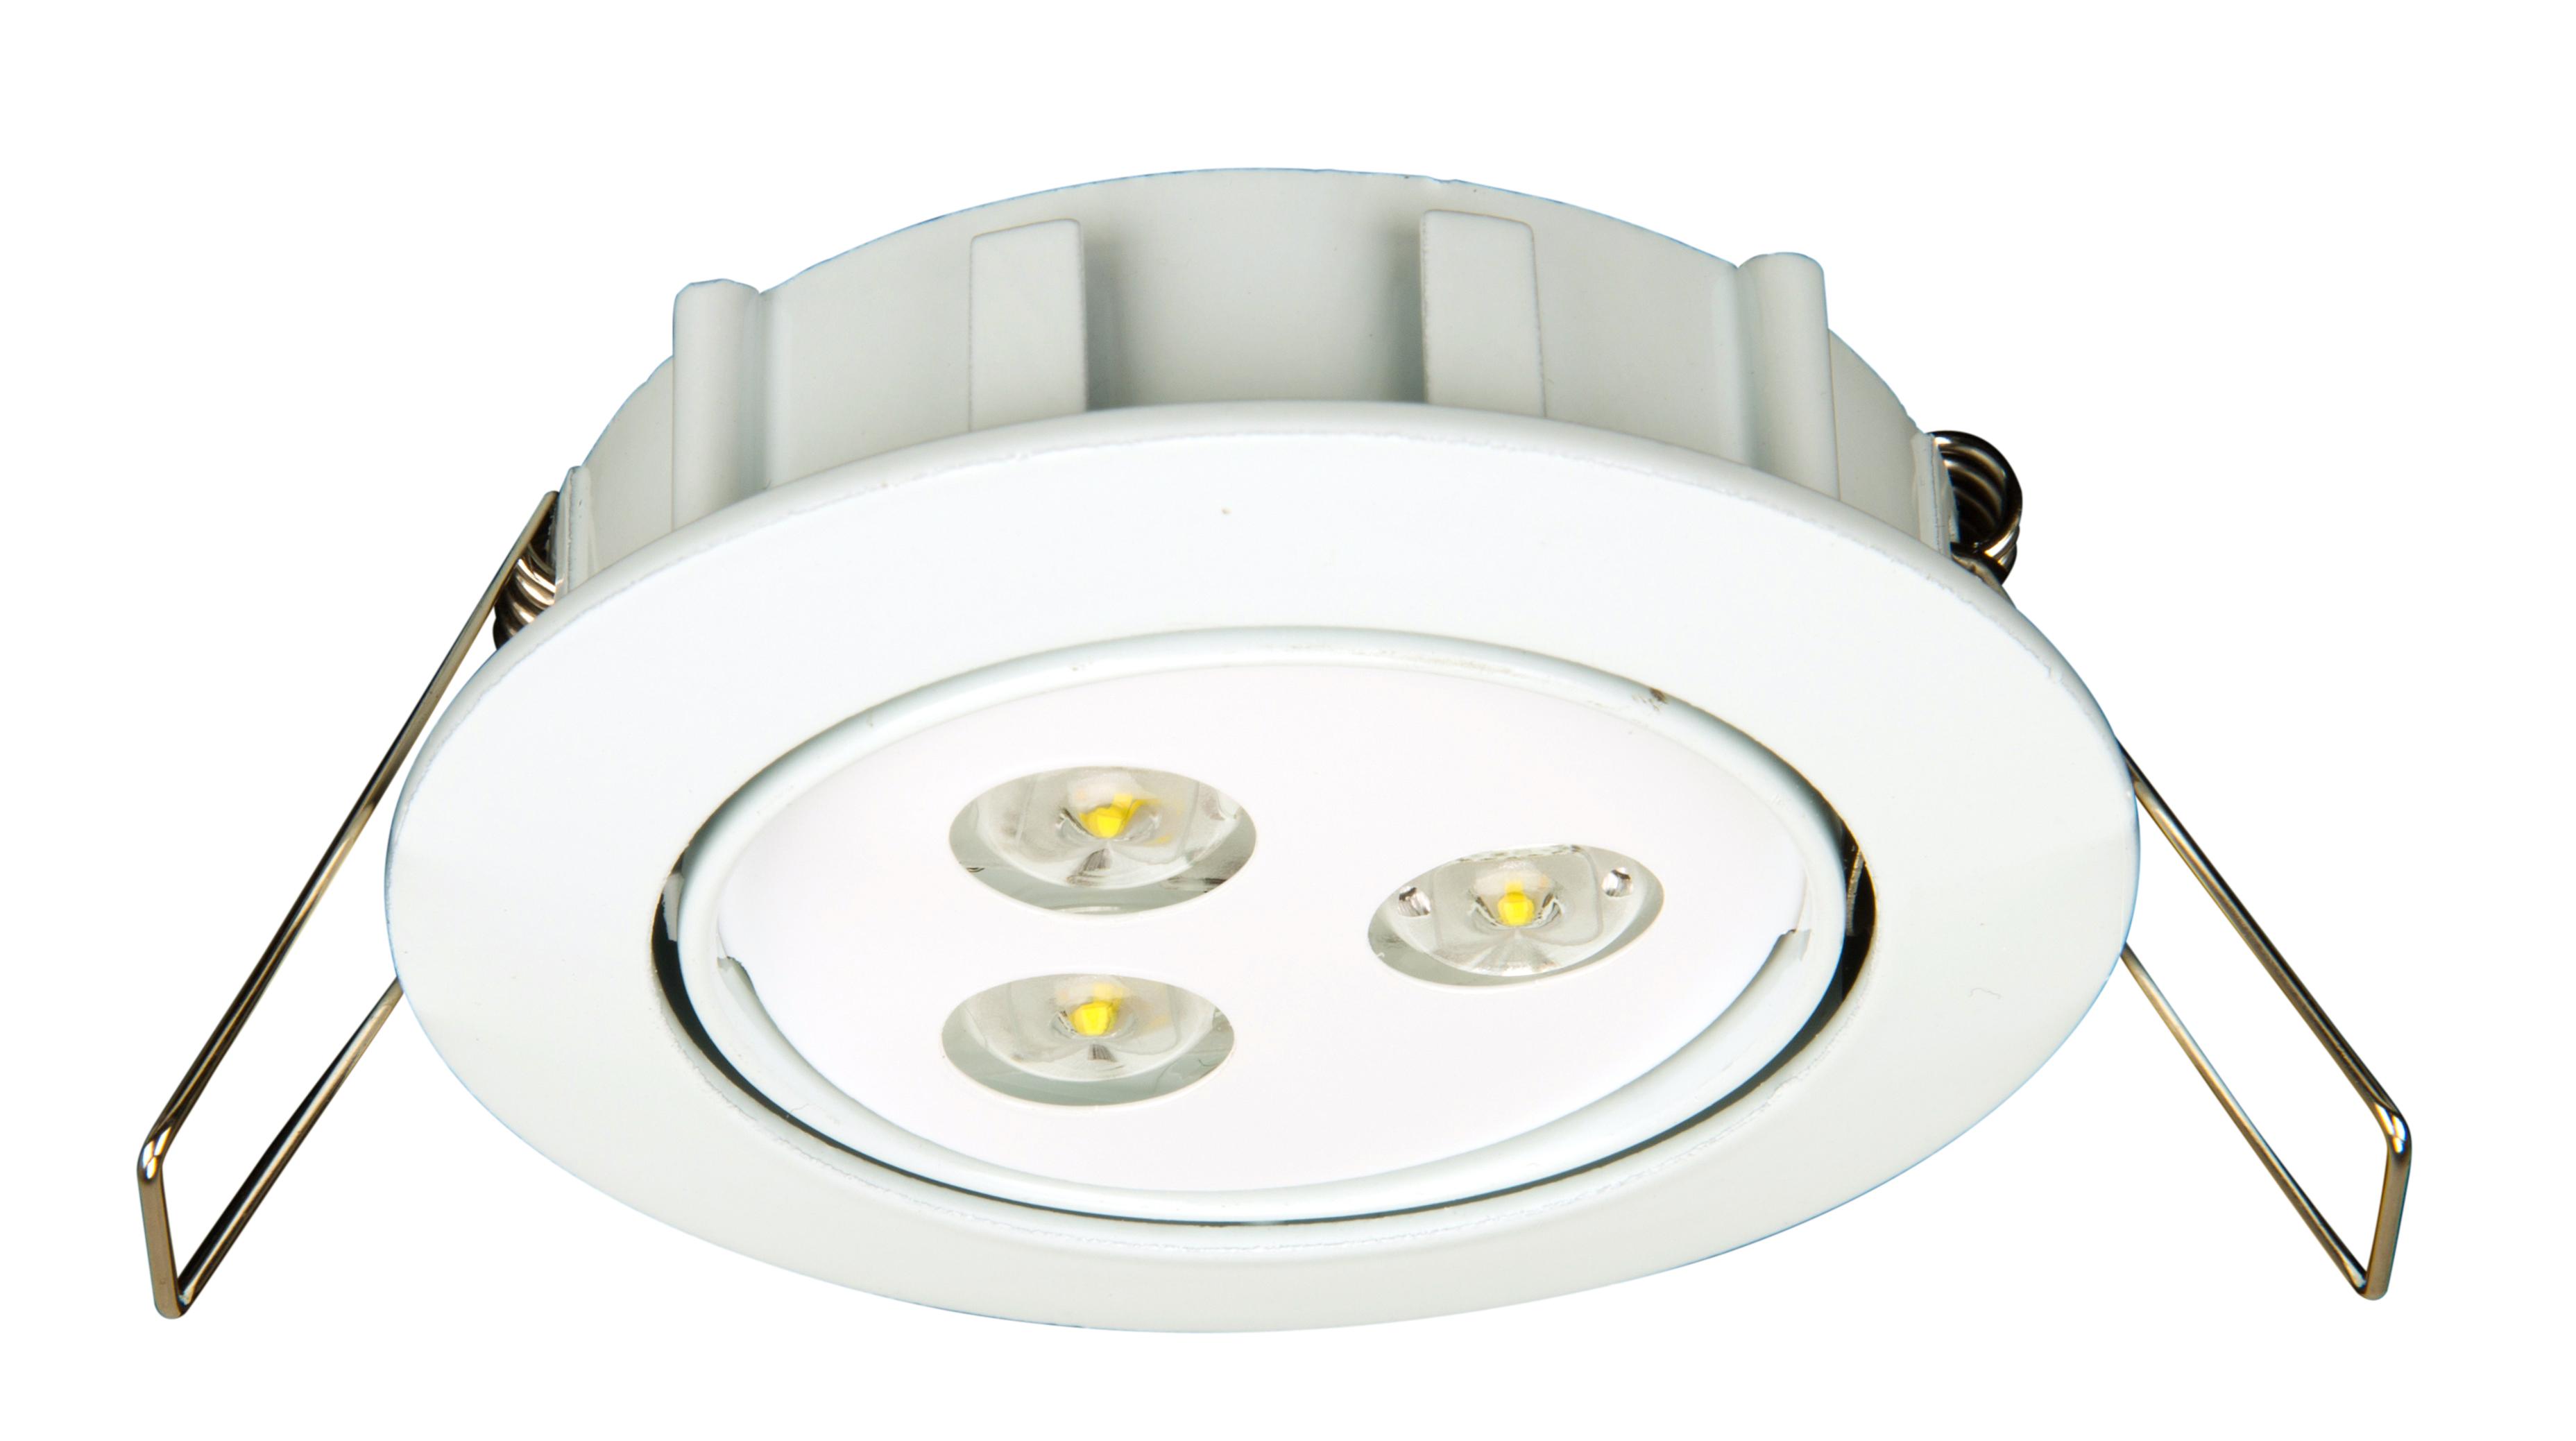 1 Stk Notleuchte DLE ERT-LED 230V Einbaumontage NLDLE029--